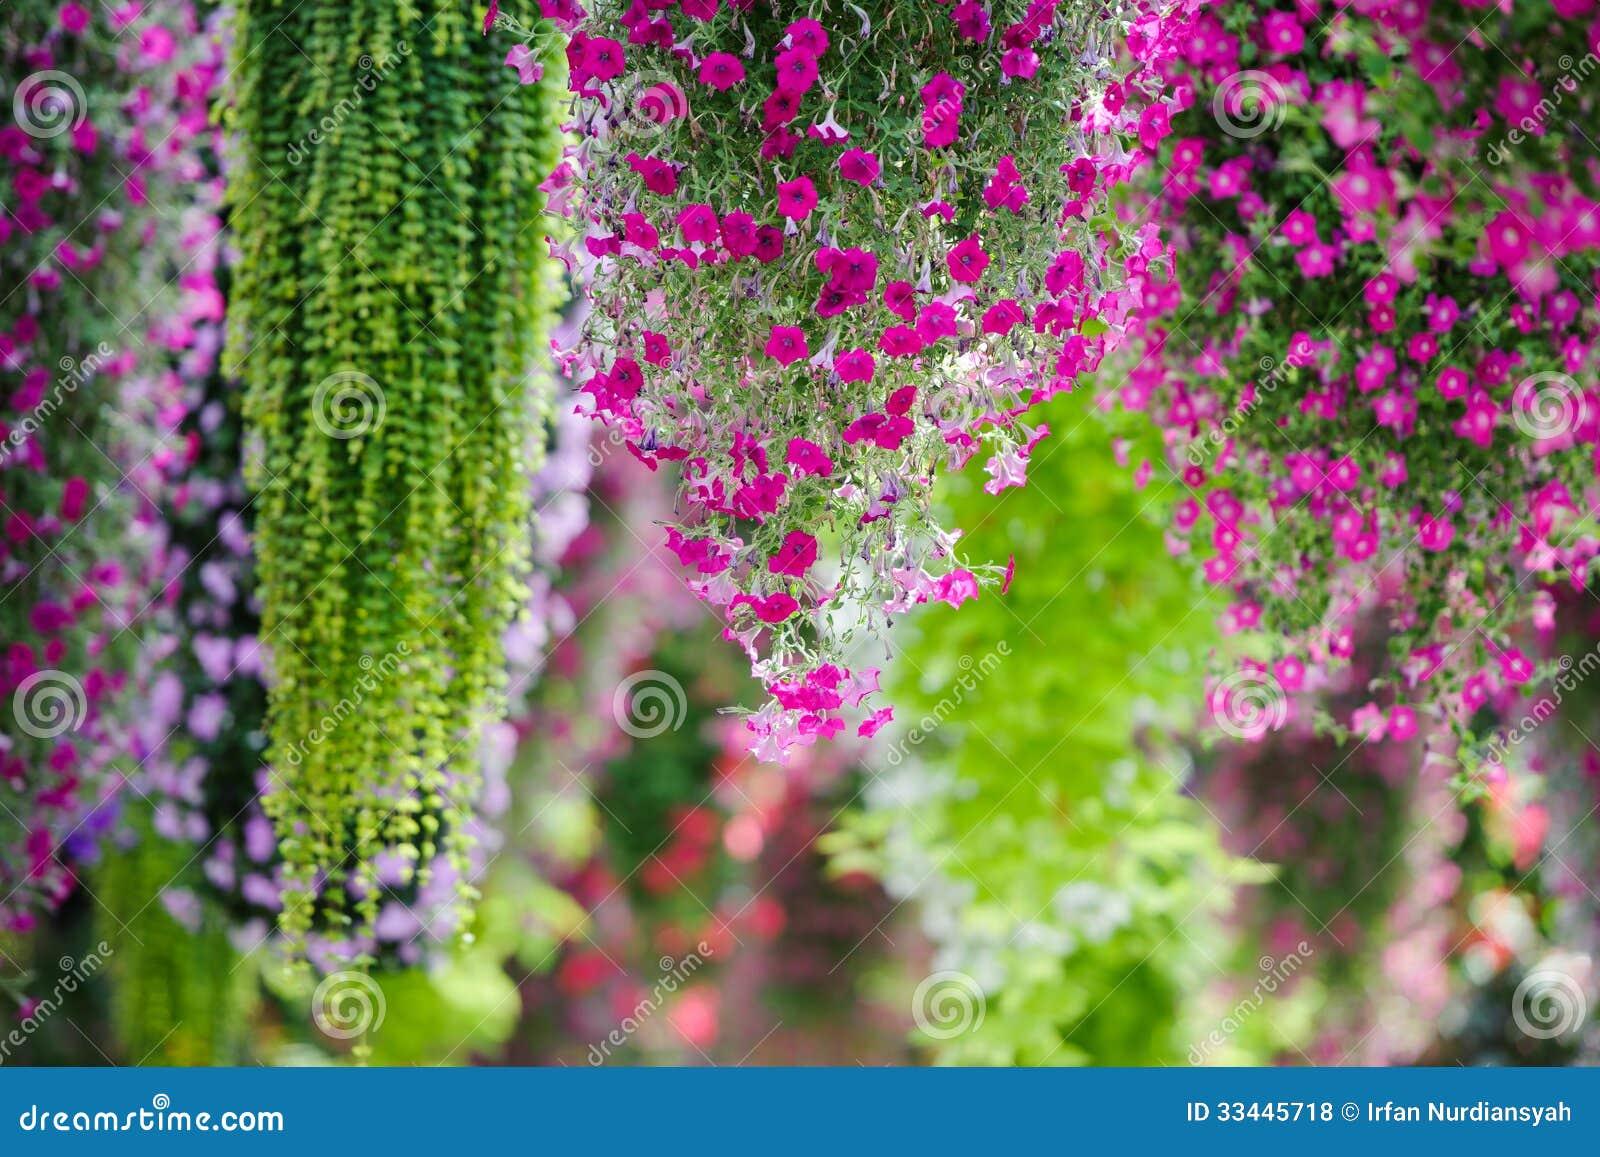 Hanging Flower Royalty Free Stock Photos - Image: 33445718